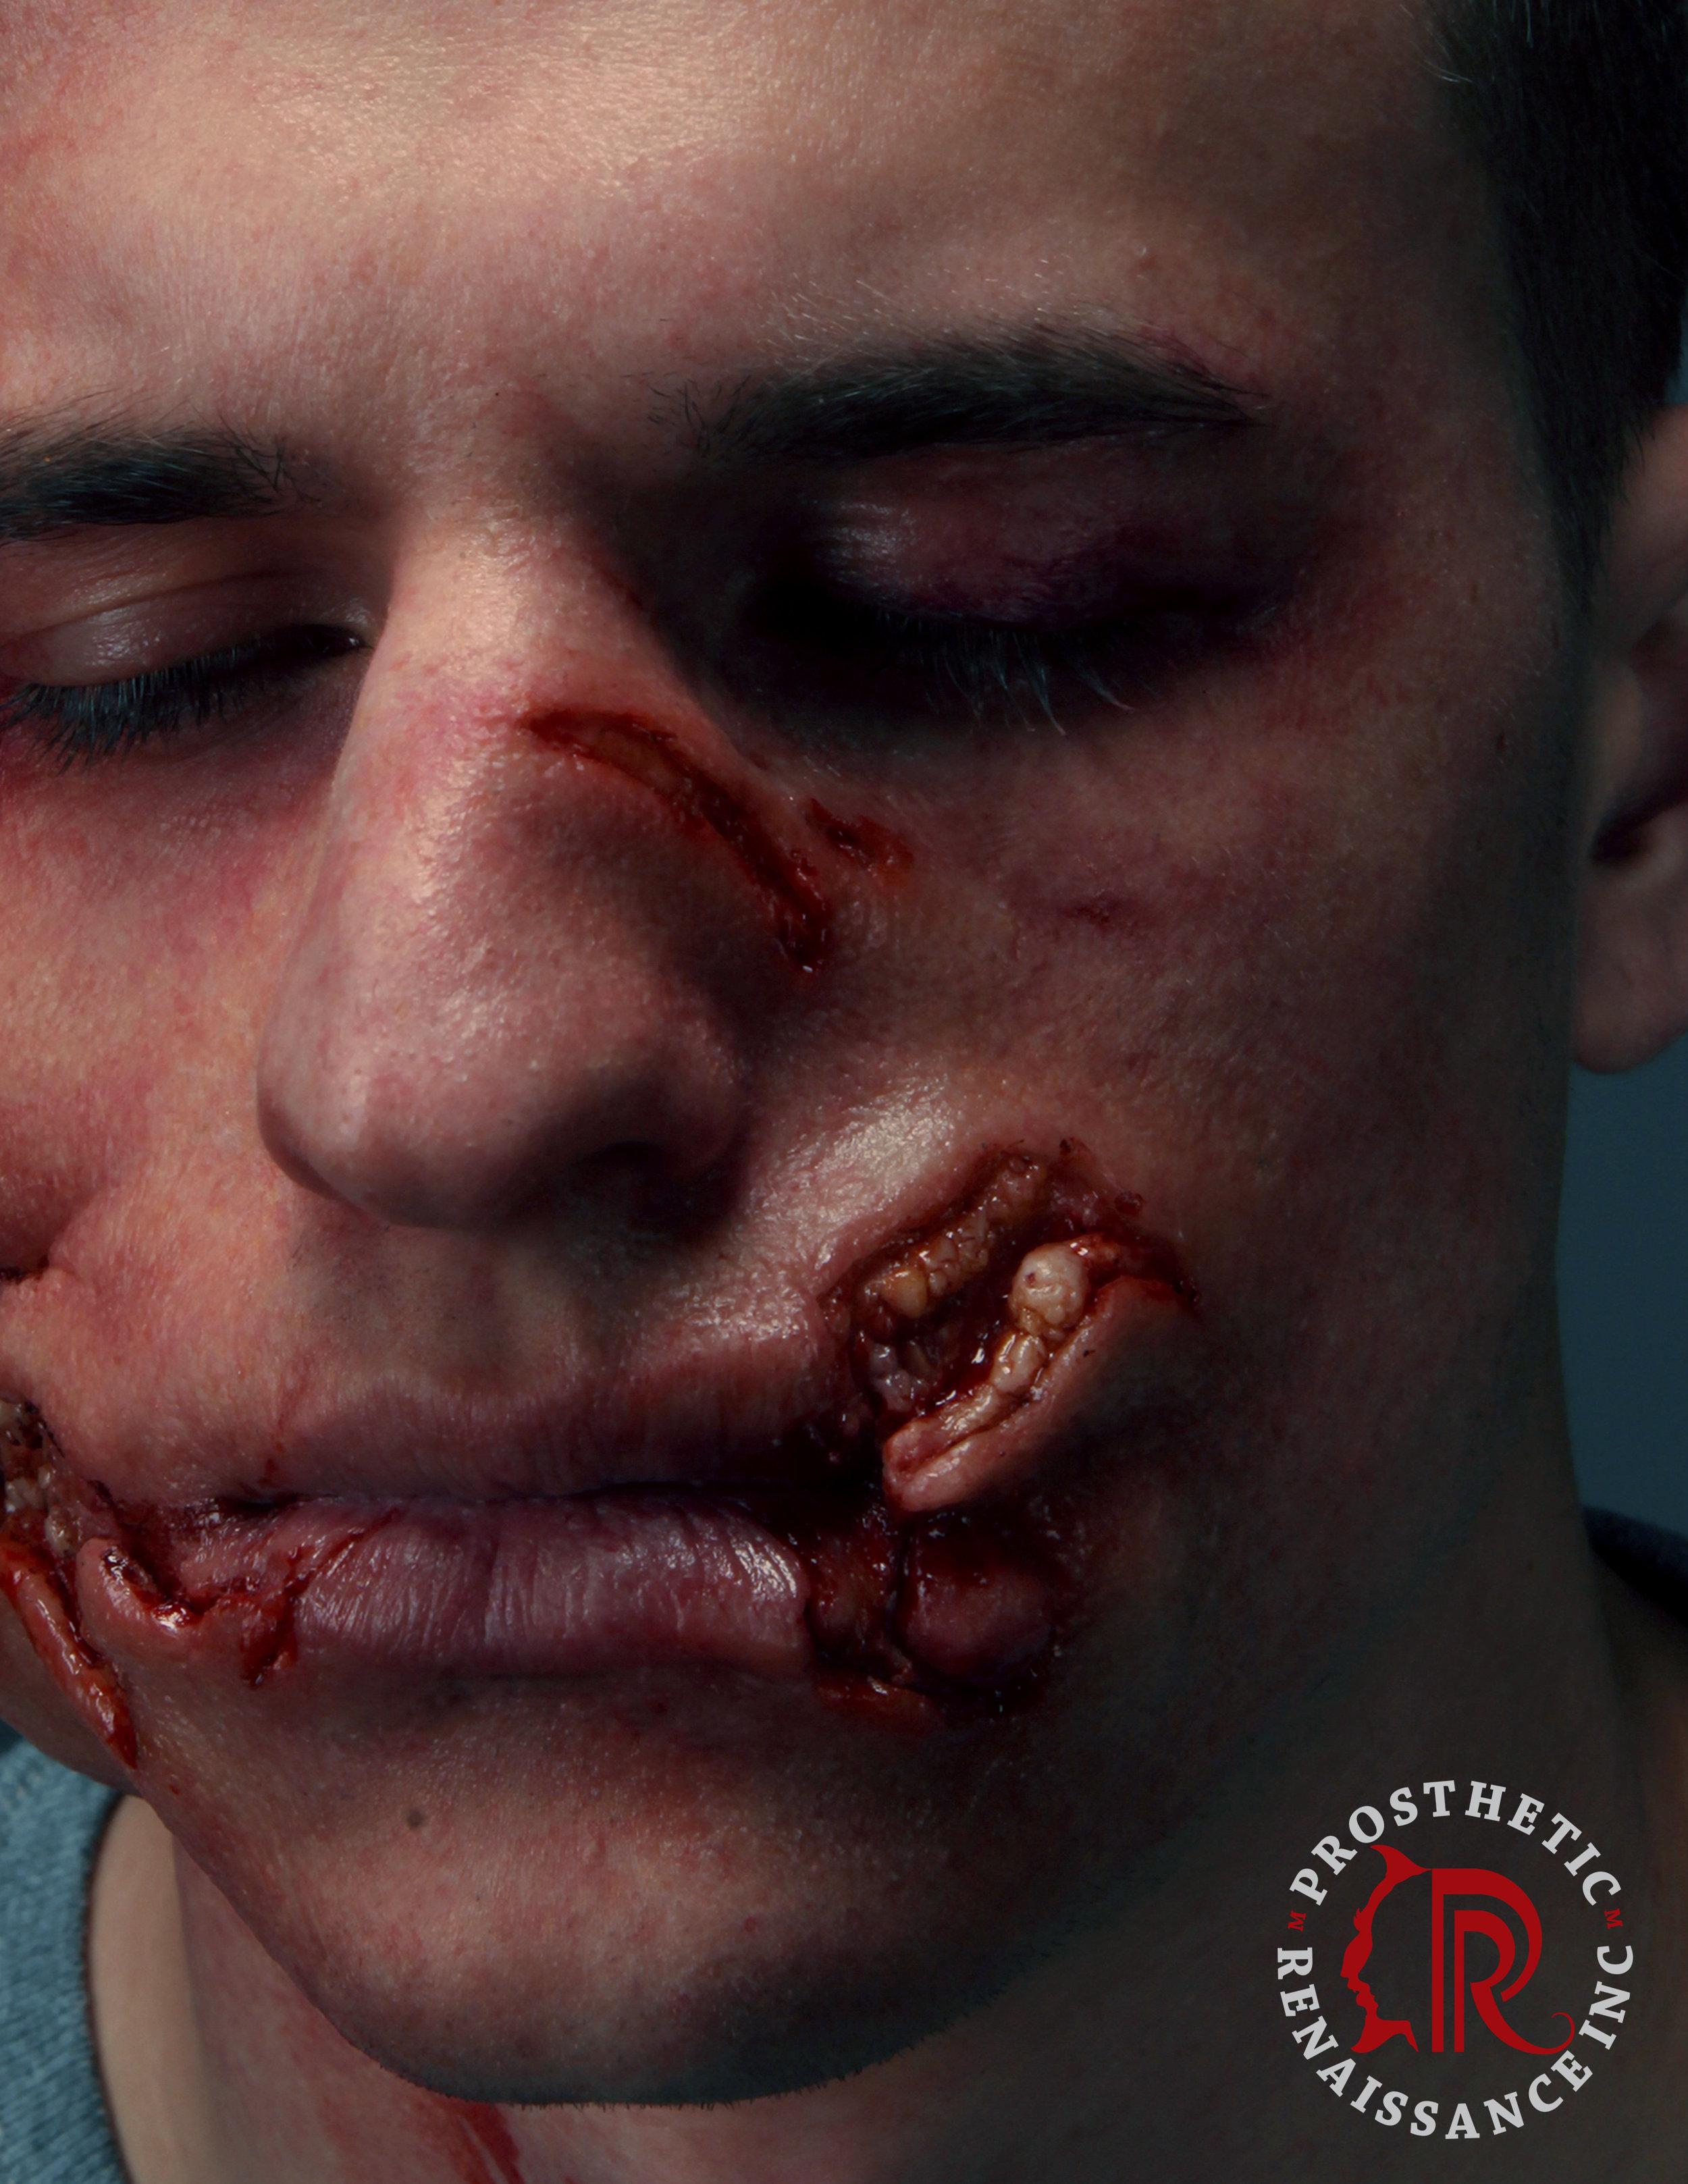 15.ViolentAttackFaceSet12.jpg